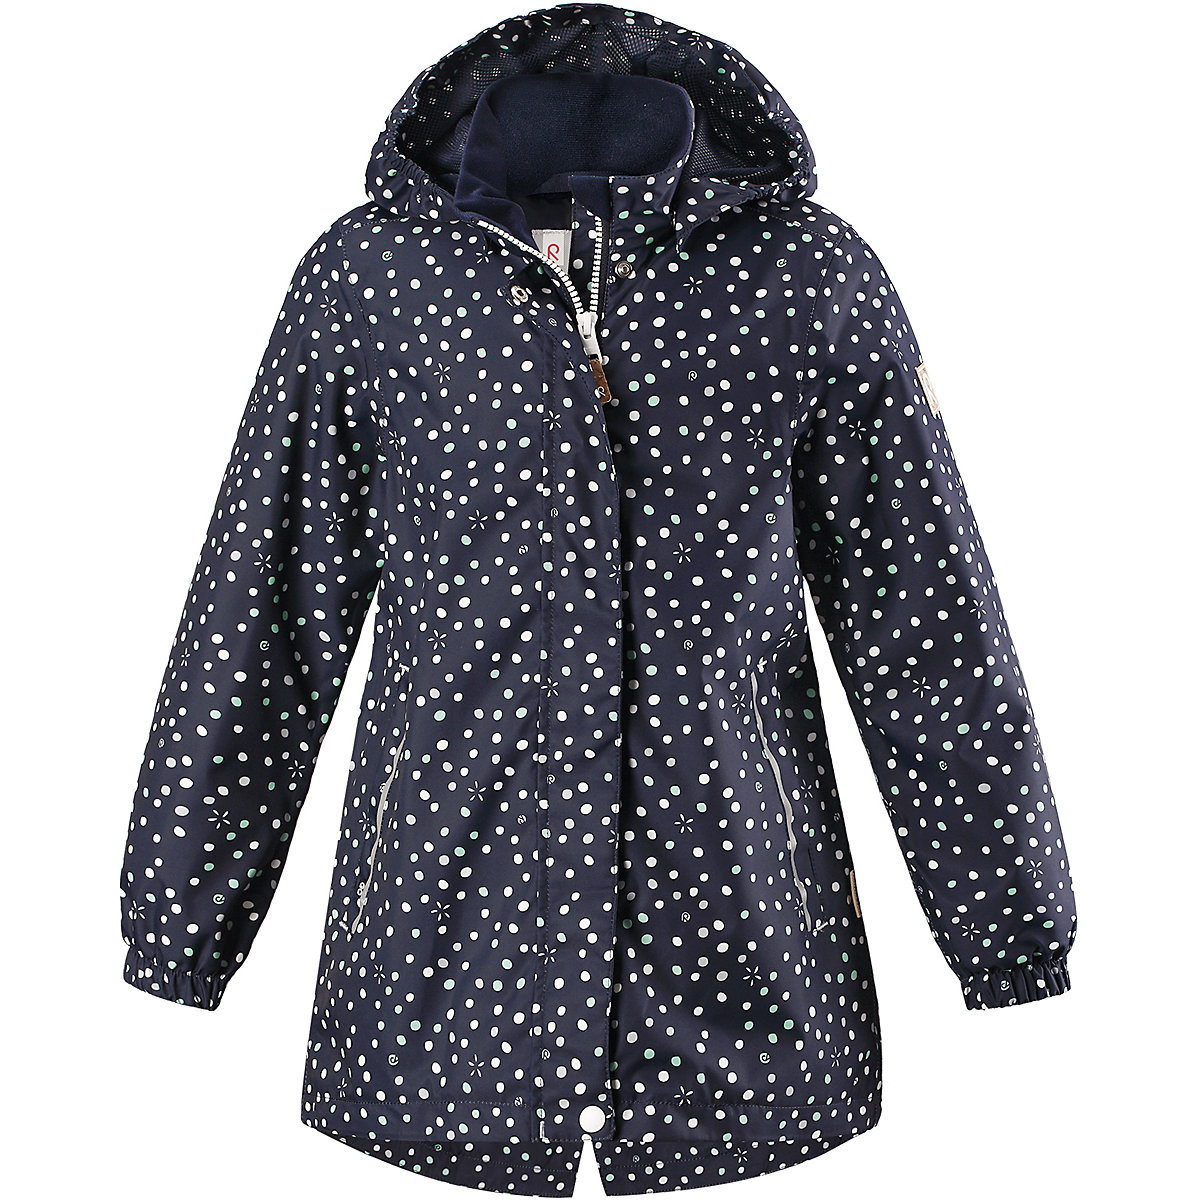 REIMA Jackets 7632638 for girls polyester winter  fur clothes girl б в бондарев н п калашников г г спирин курс общей физики книга 1 механика учебник